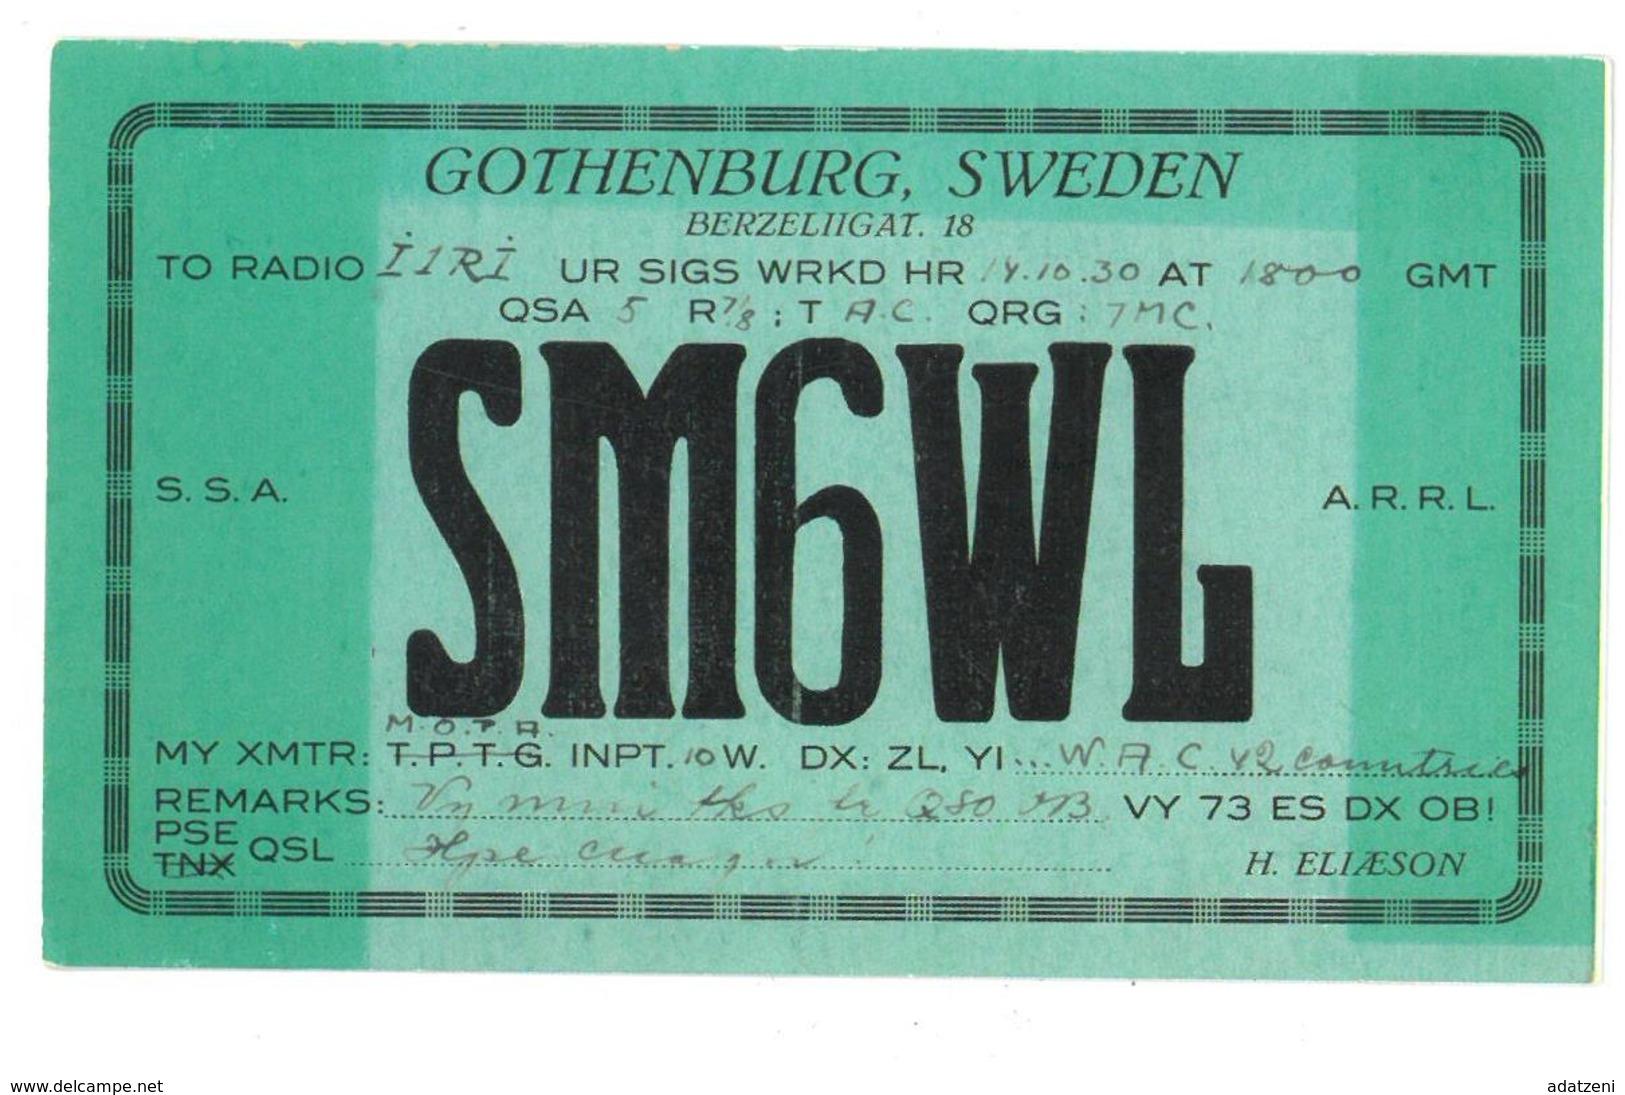 Pubblicità Cartolina Stazione CB Gothenburg, Sweden SM6WL To Radio I1RI Ur Sigs WRKD HR 14.10.30 Condizioni Come Da Scan - CB